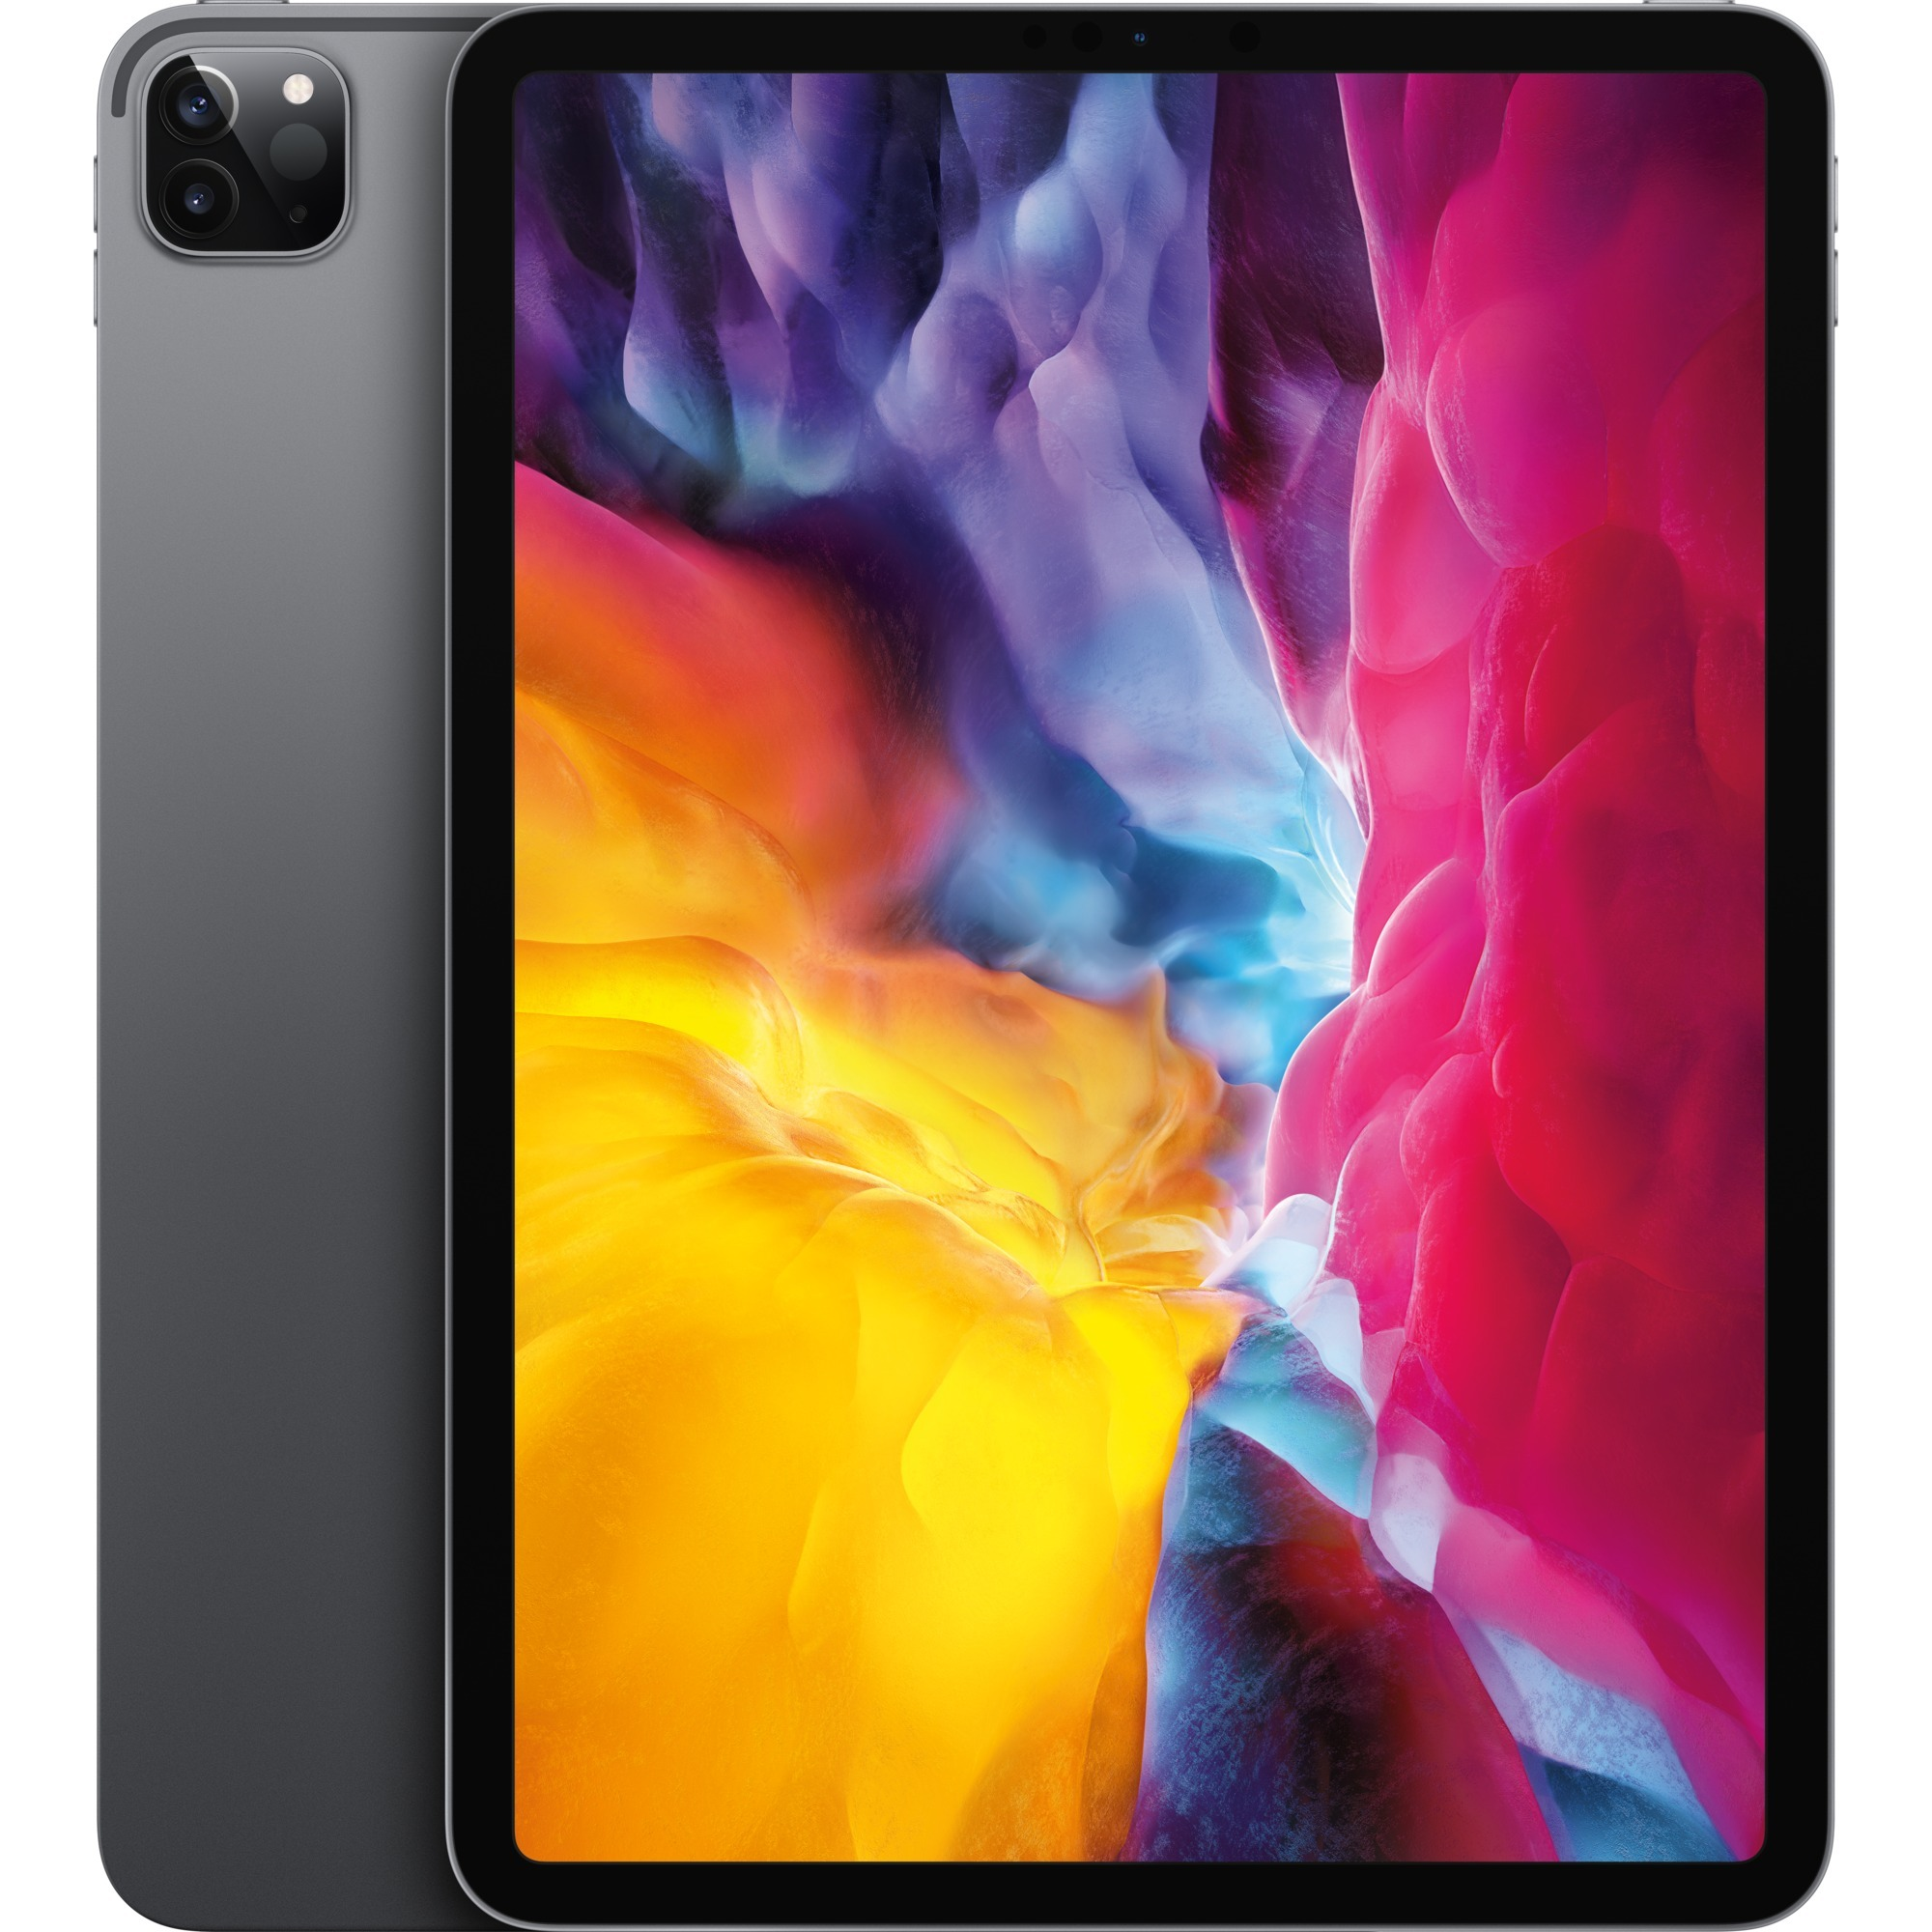 apple ipad pro 512 gb 27,9 cm (11) wi-fi 6 (802.11ax) ipados grigio, tablet pc